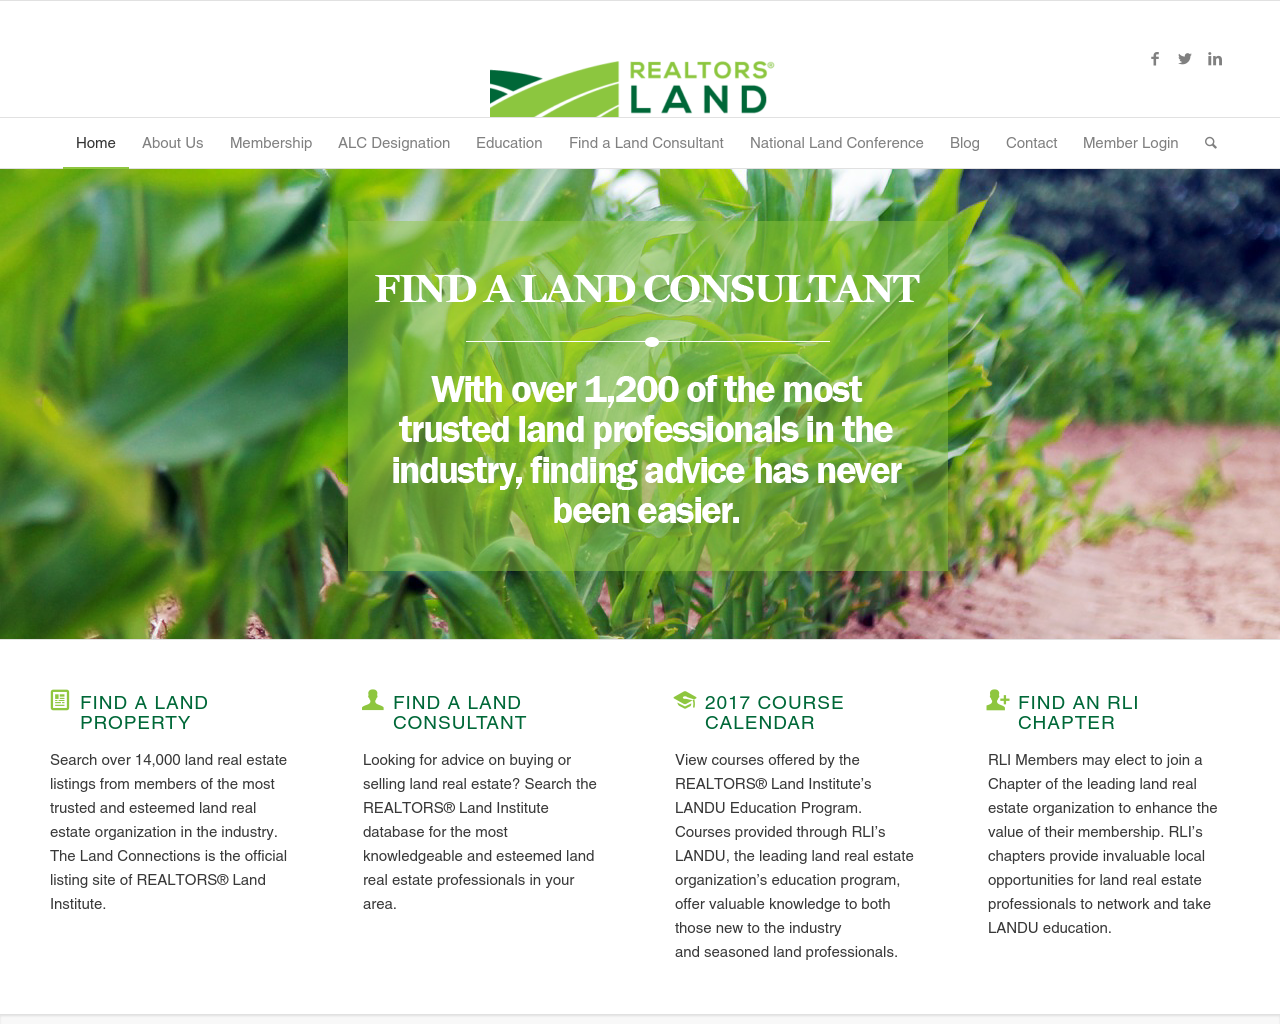 Rliland.com-Advertising-Reviews-Pricing